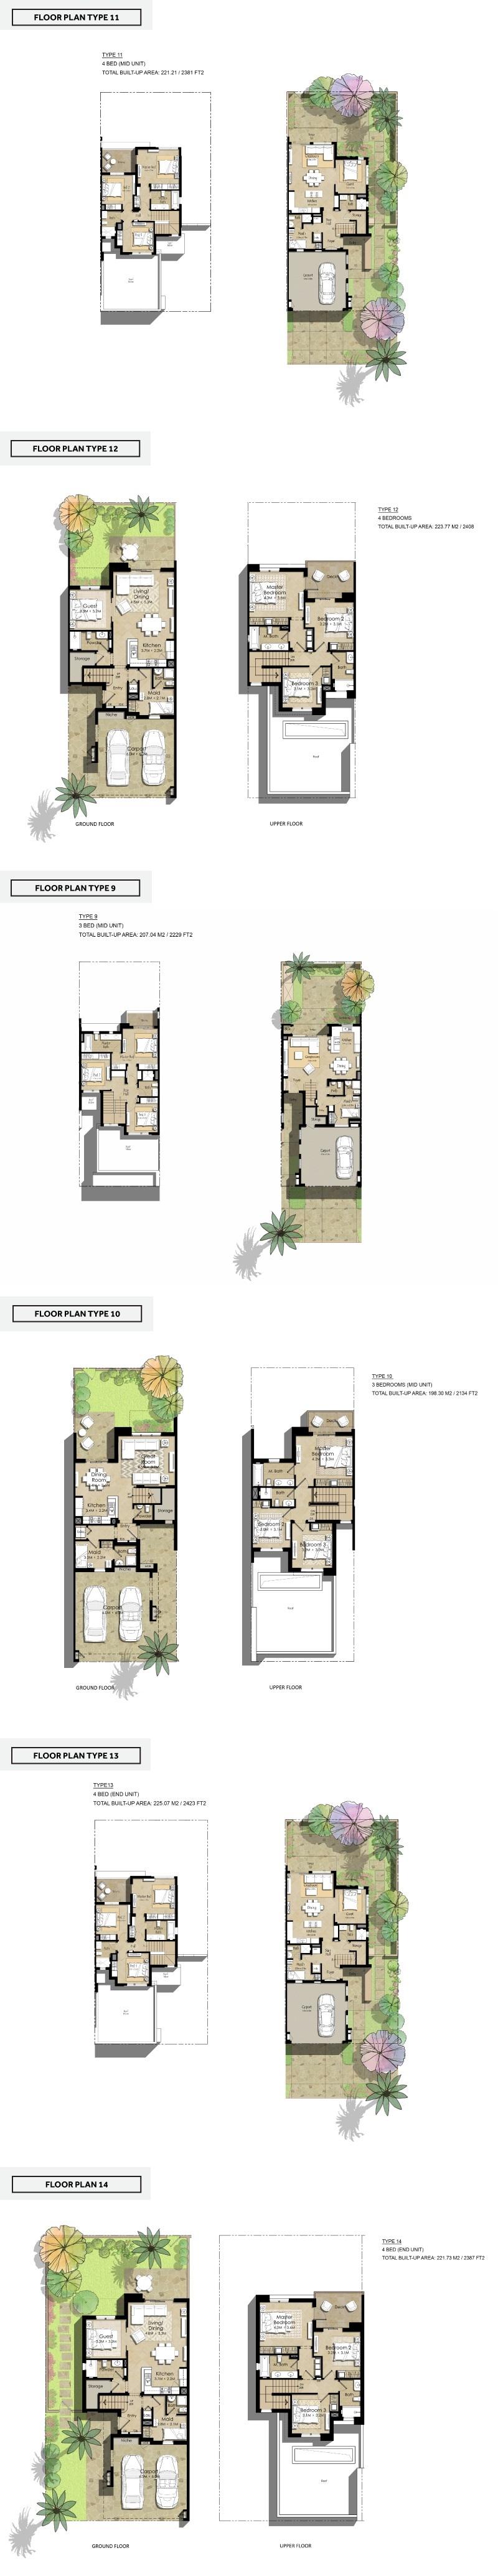 Nshama Safi Townhouses Dubai 3